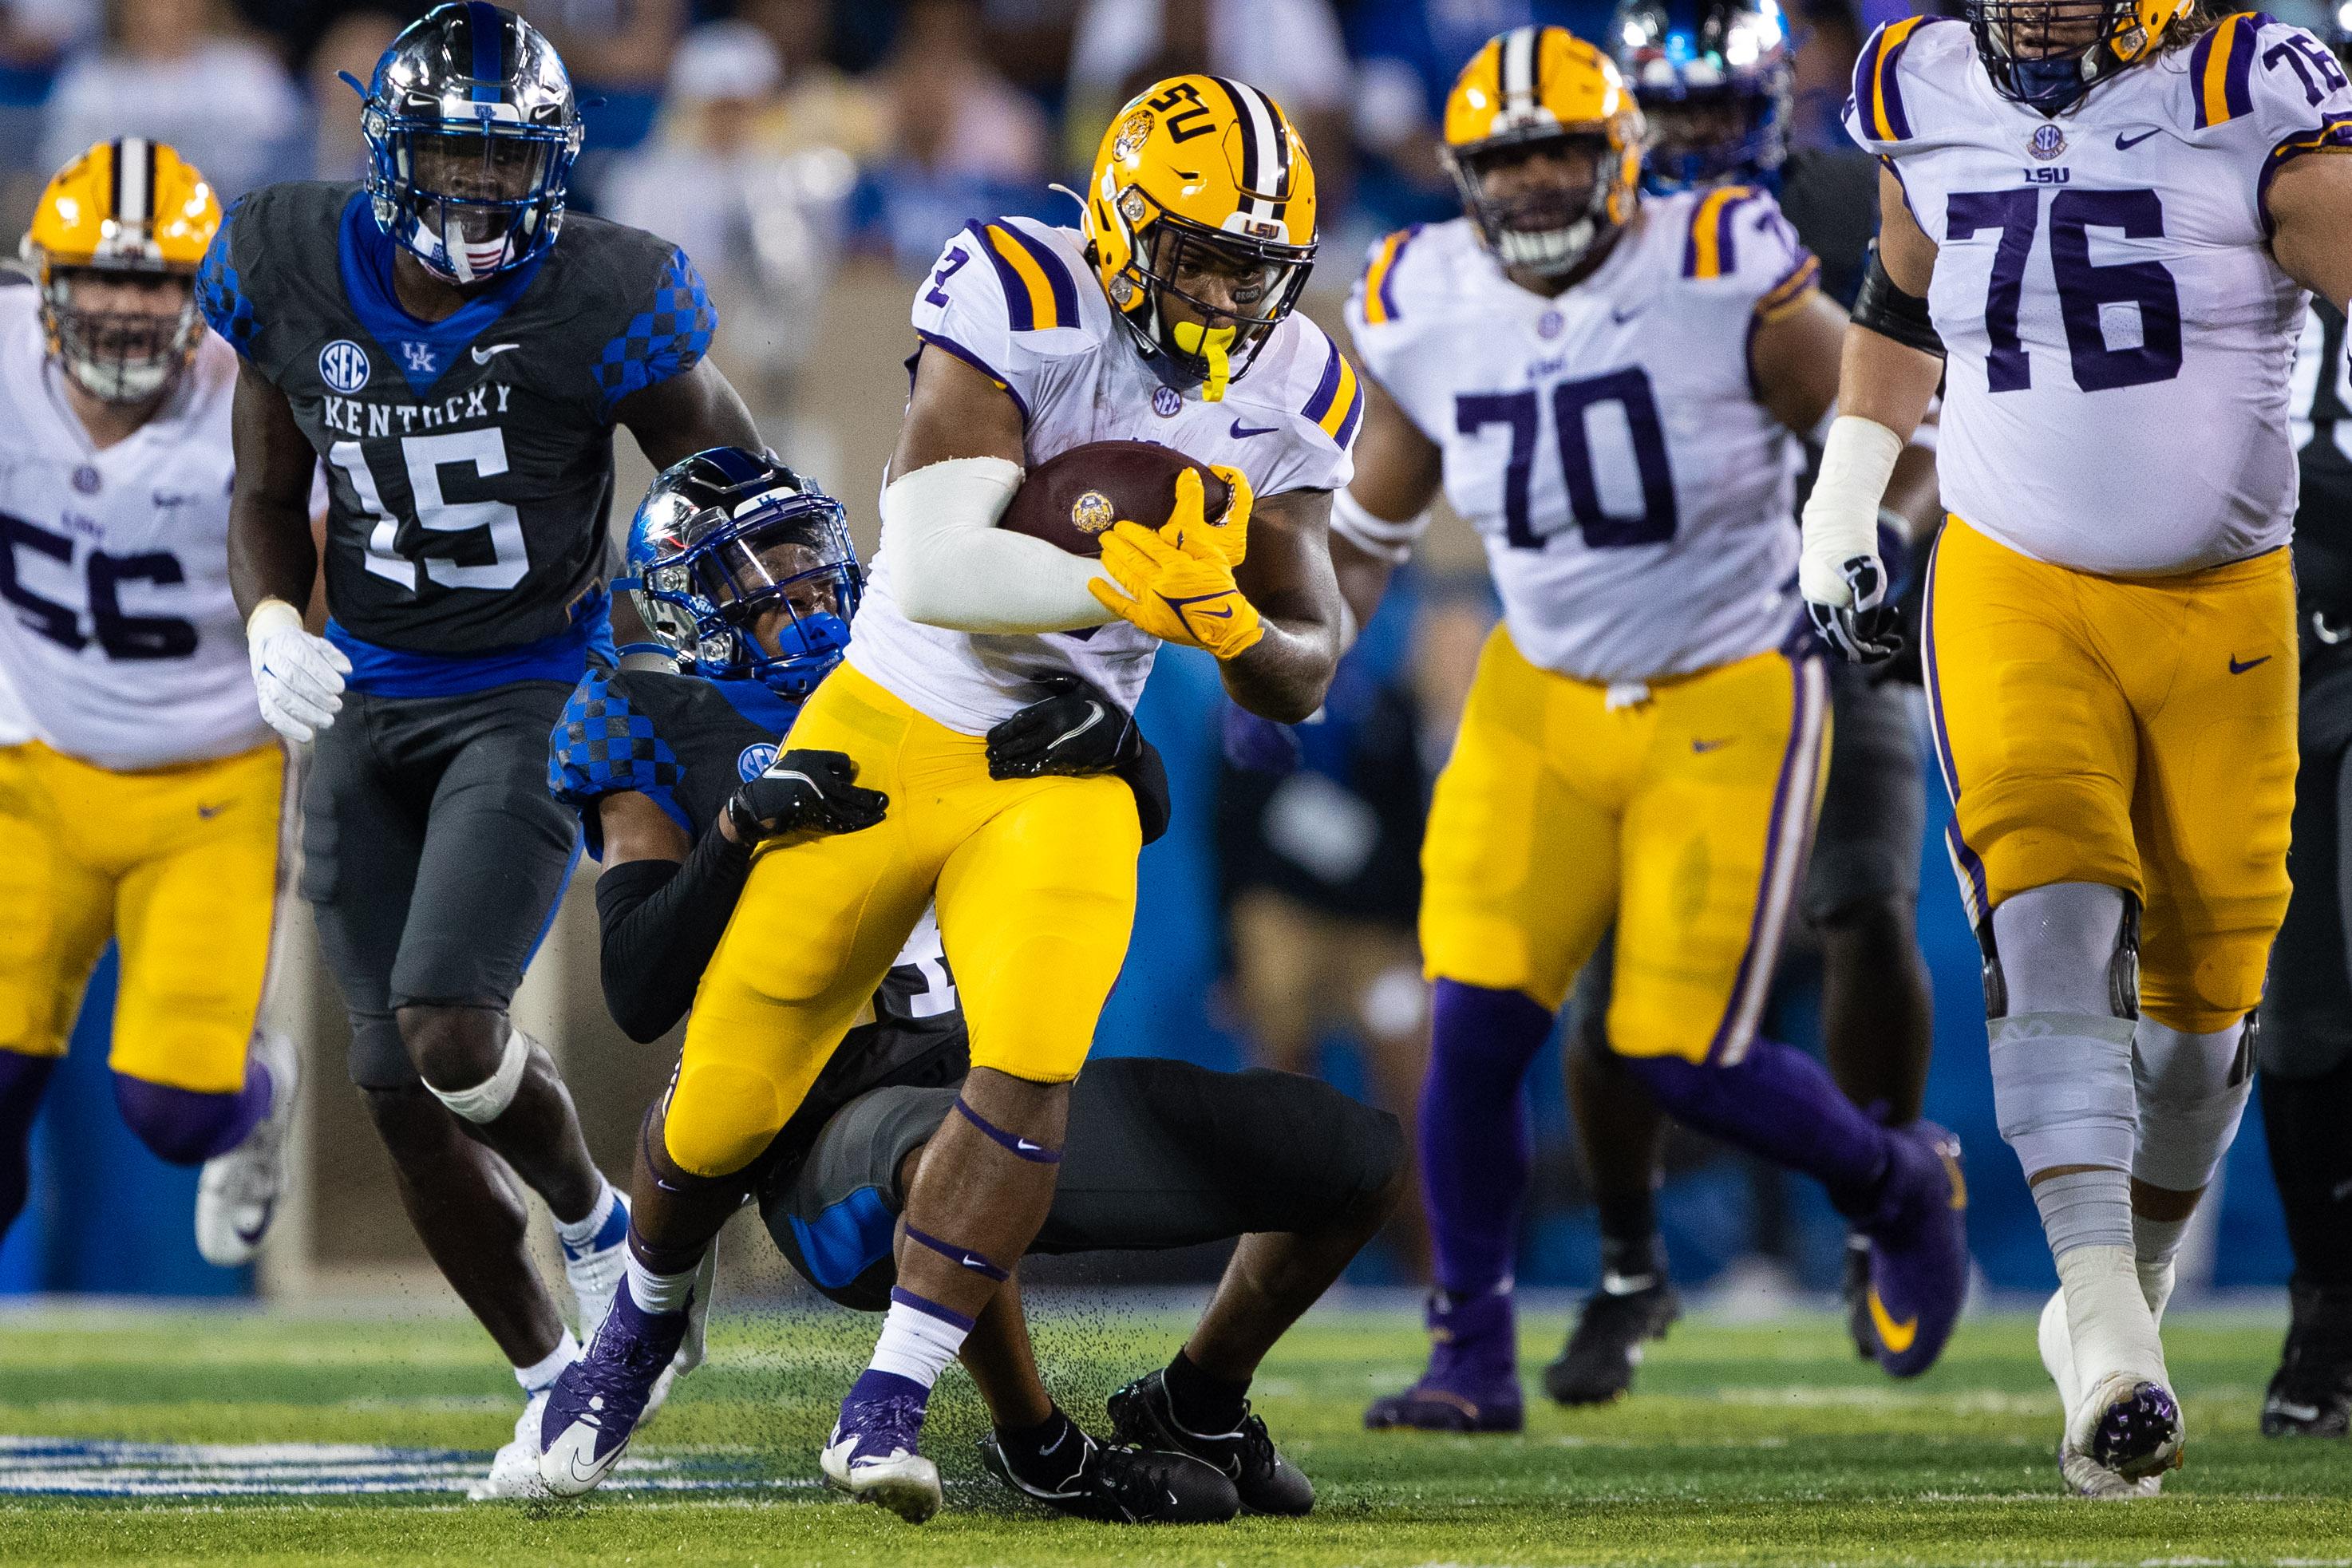 NCAA Football: Louisiana State at Kentucky